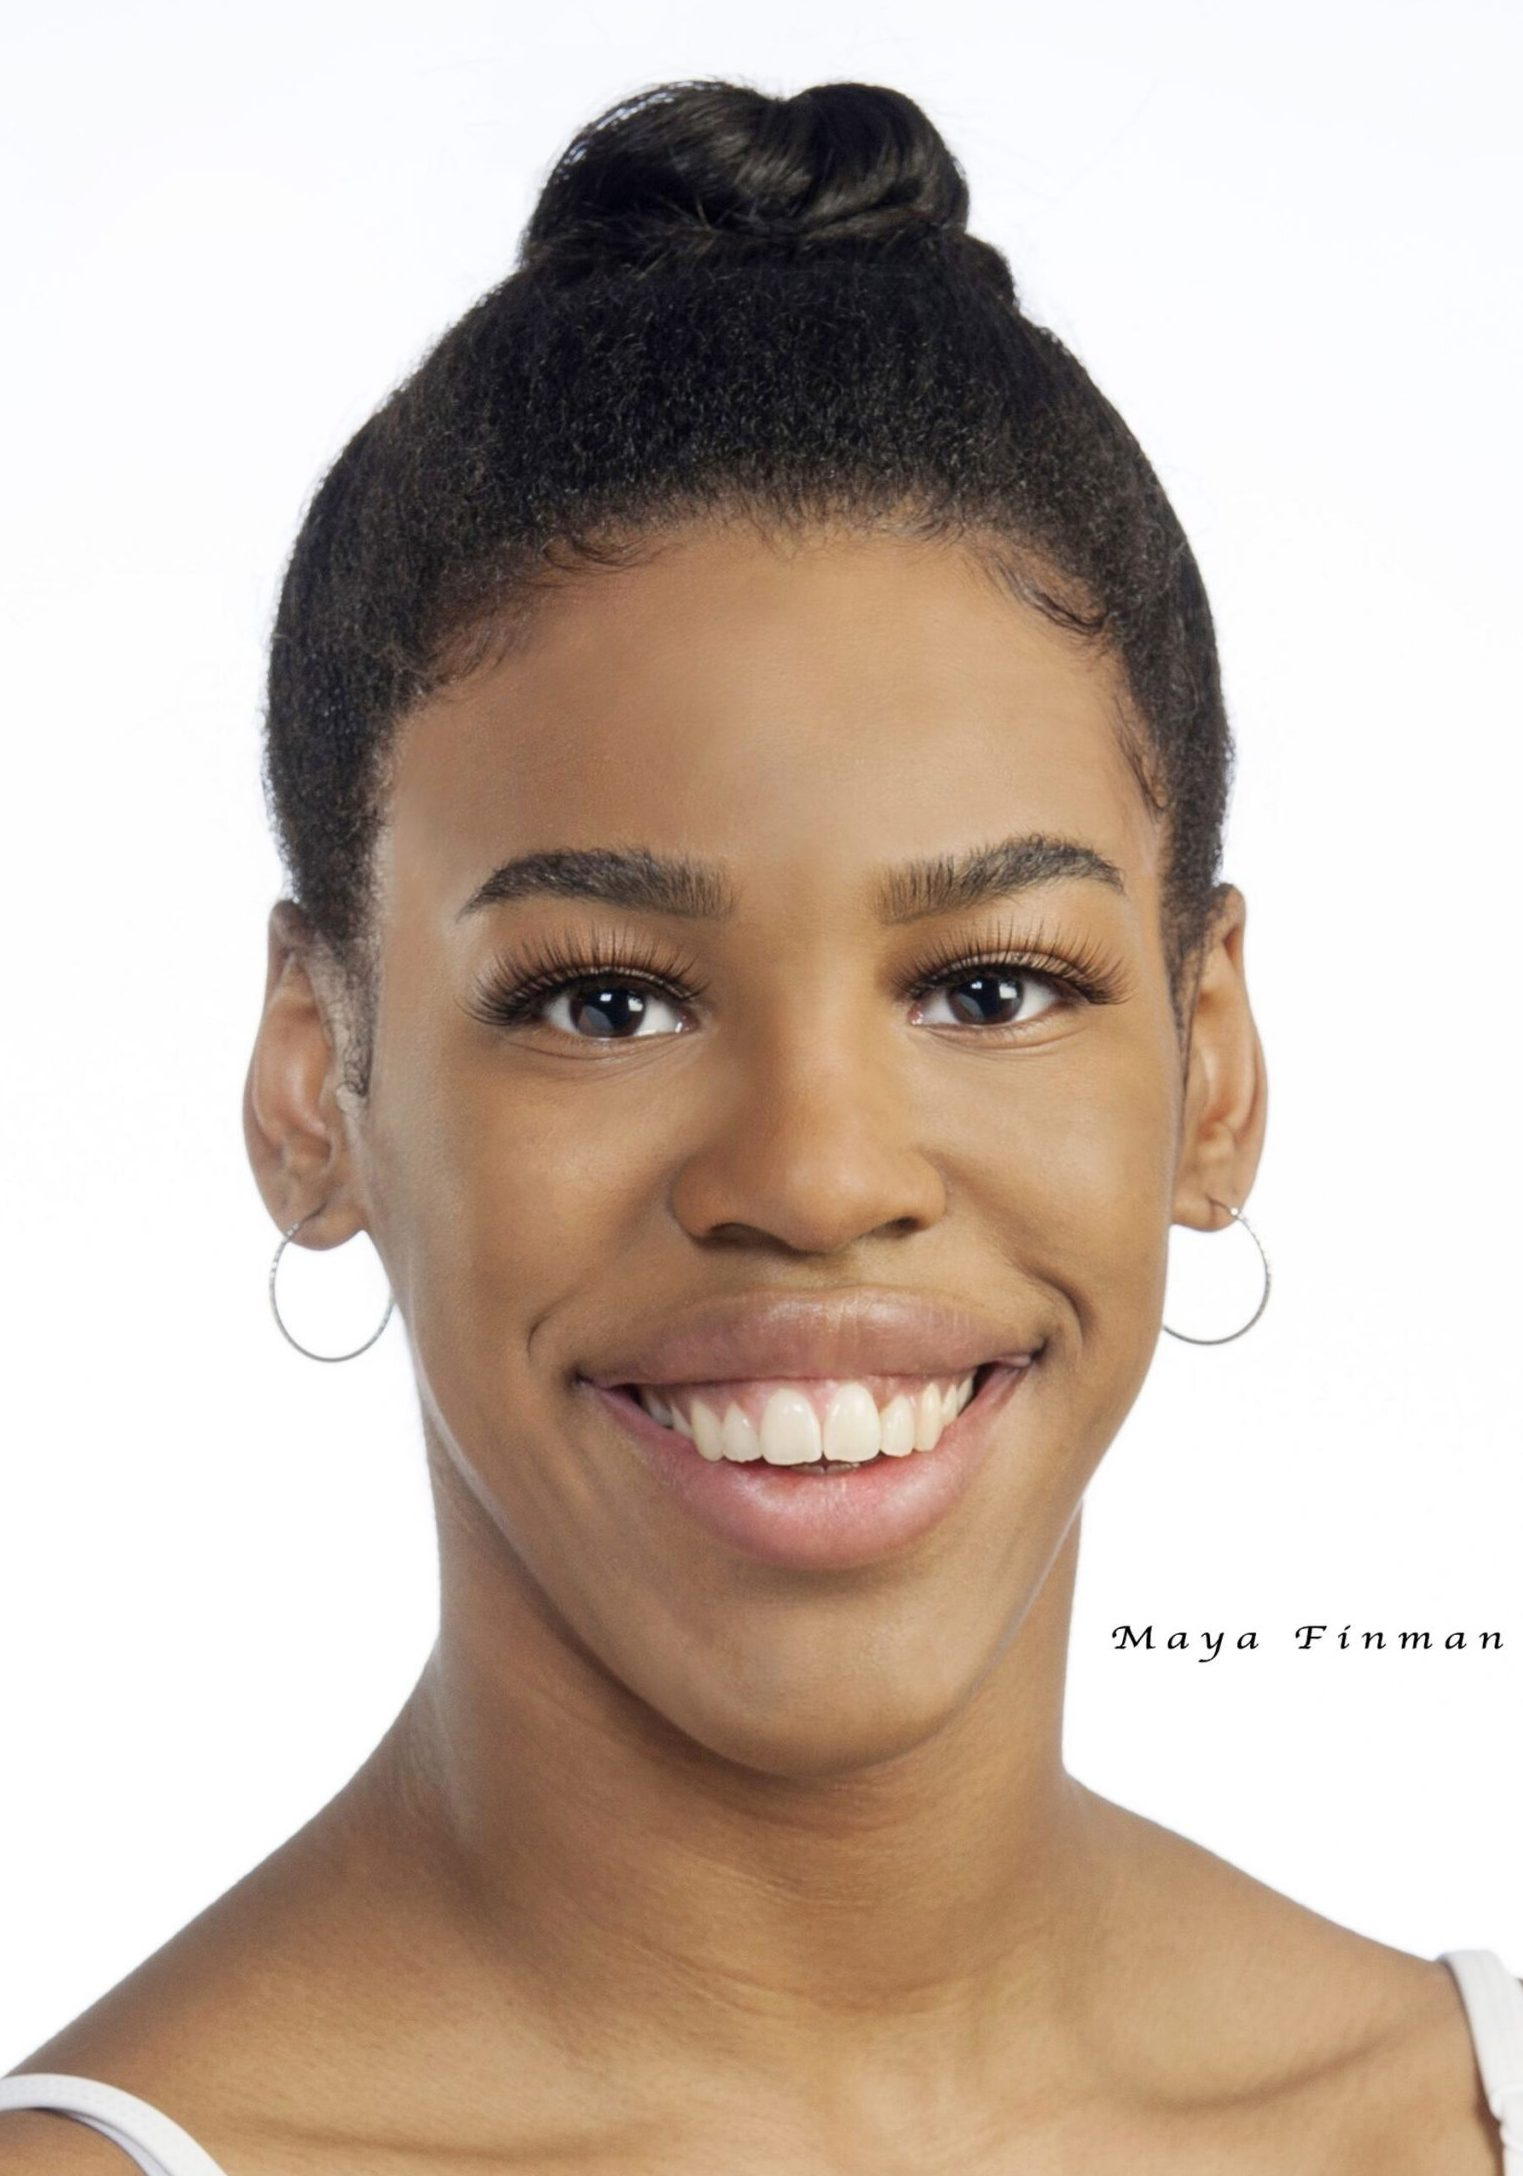 Maya Finman Palmer